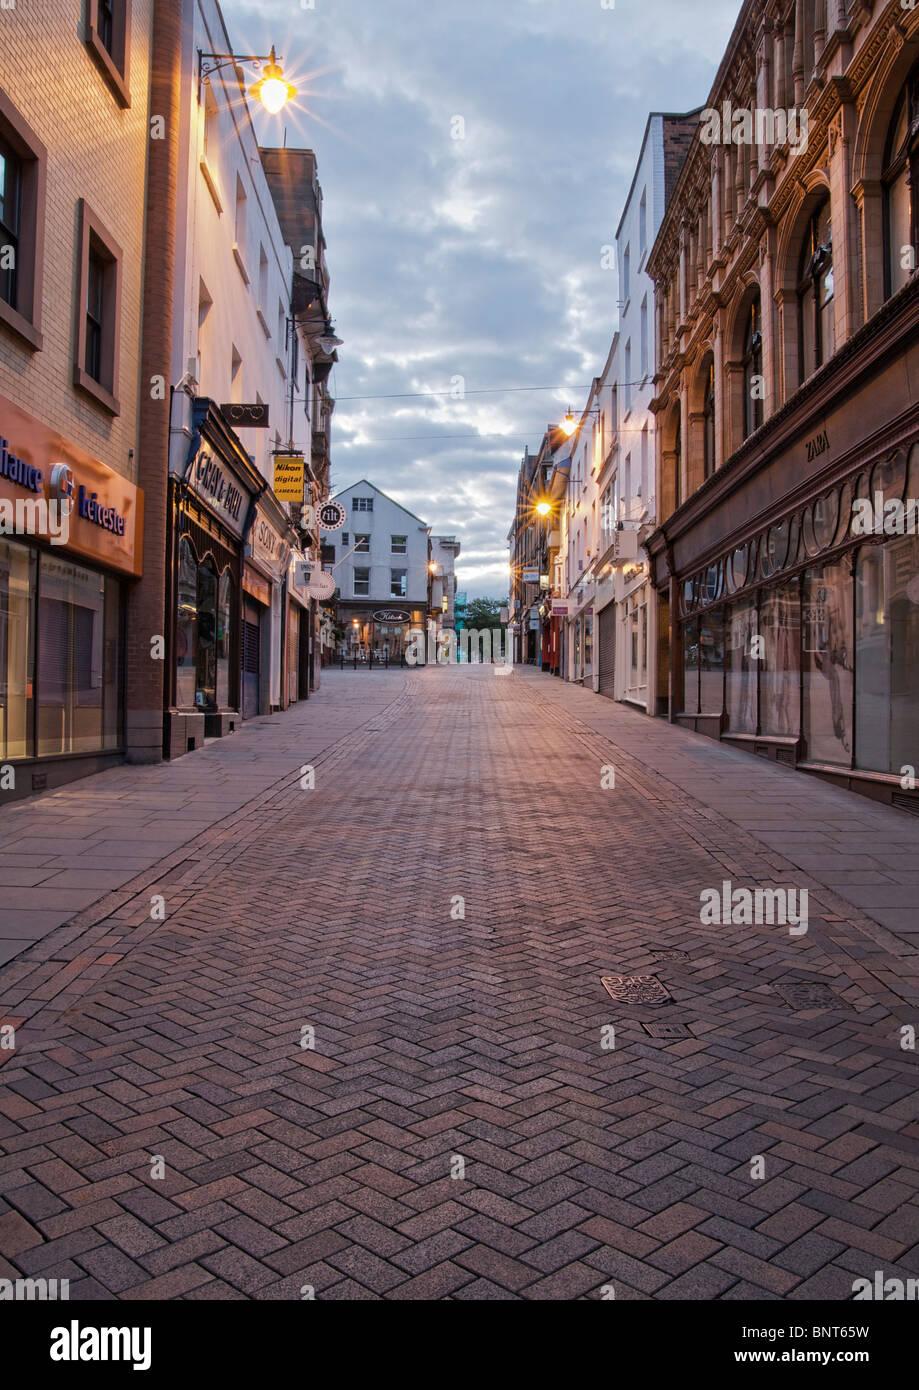 Pelham Street Nottingham Nottinghamshire United Kingdom - Stock Image